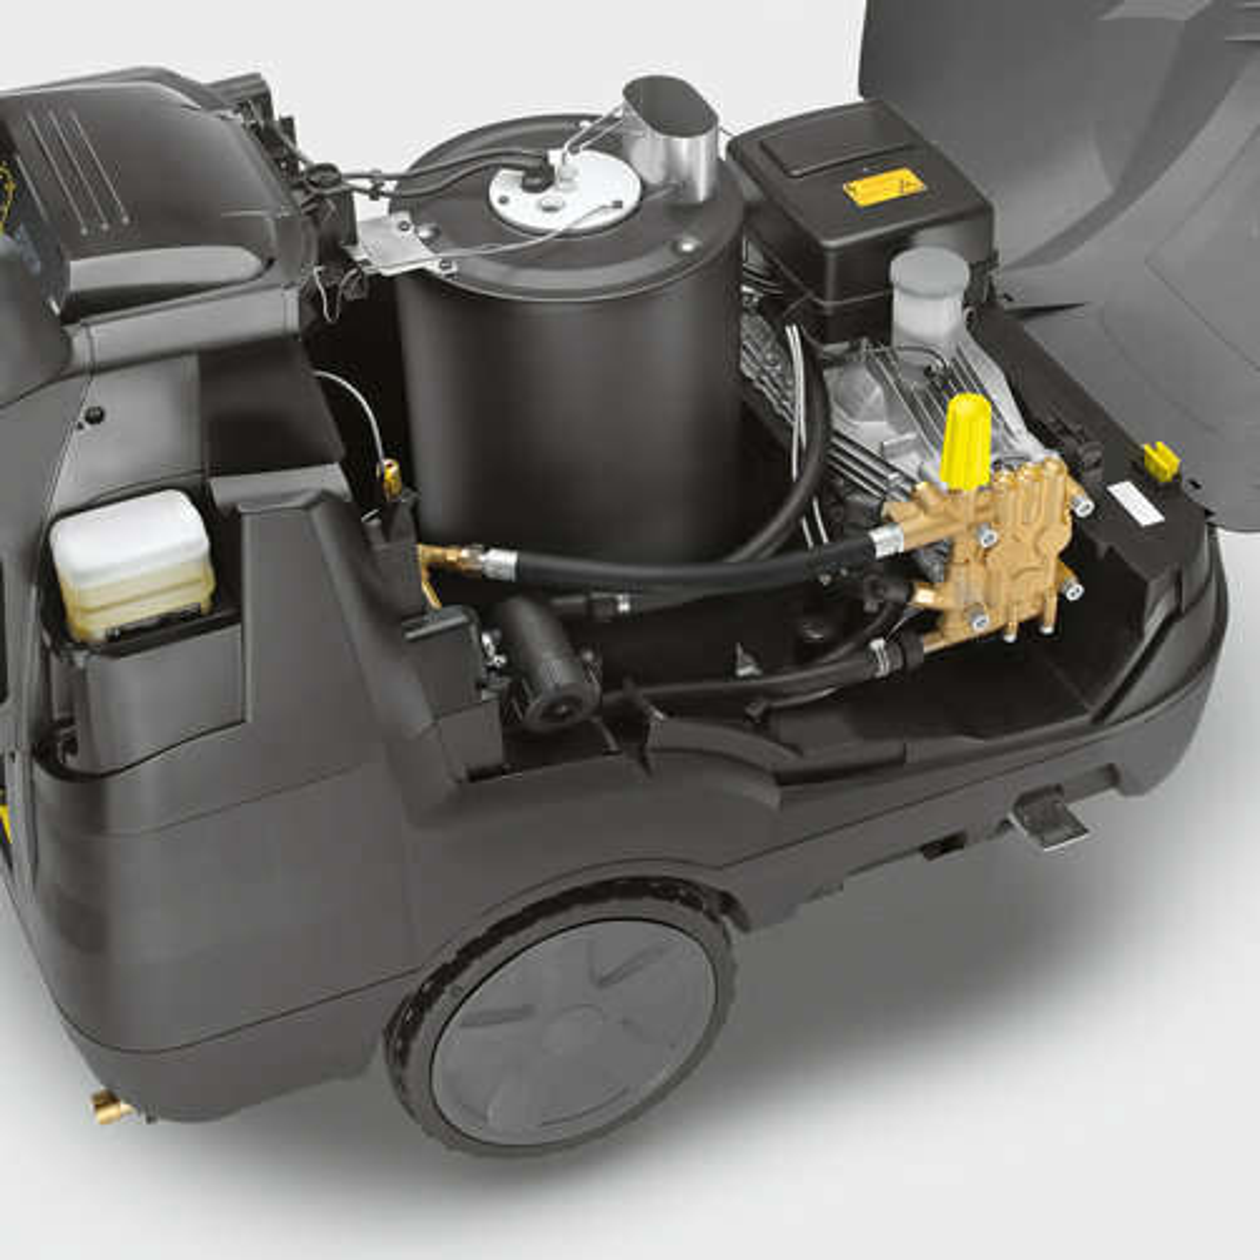 HDS 13/20-4 S: Alta rentabilidad